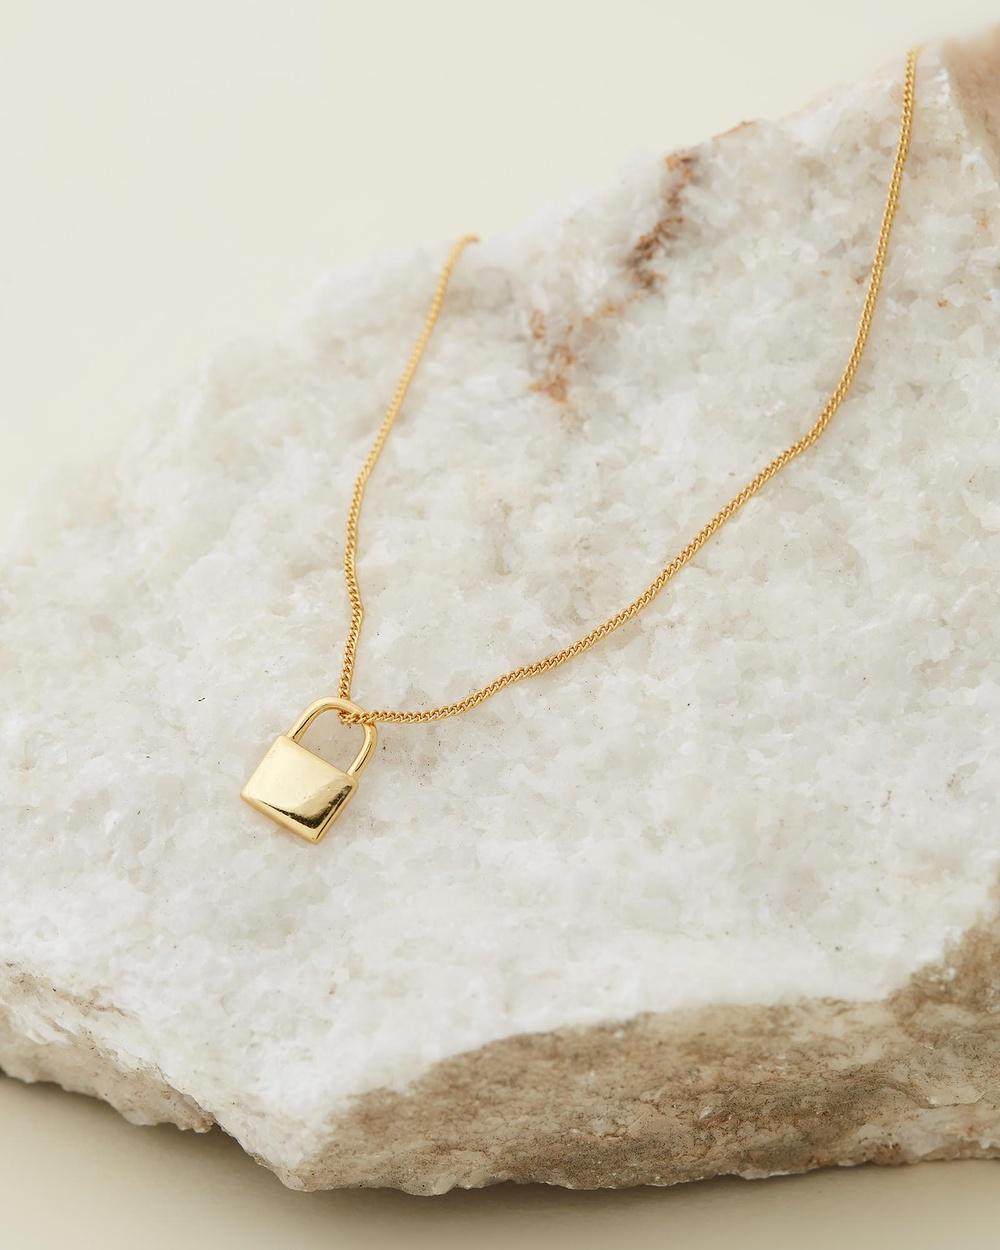 Avant Studio Seine Mini Lock Necklace Jewellery Gold